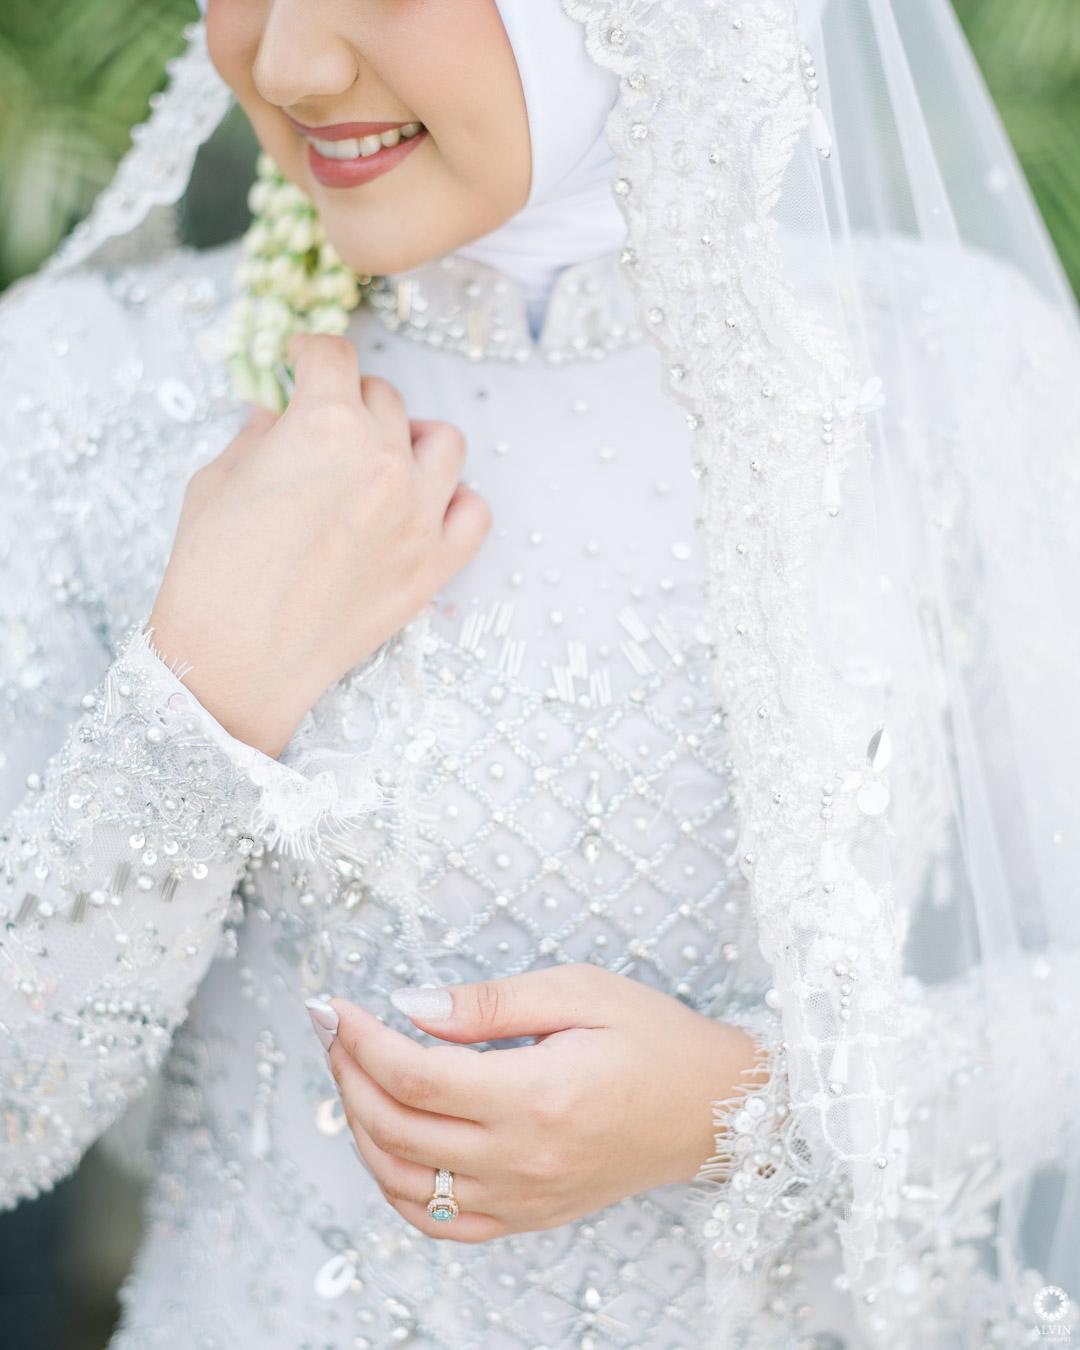 DSCF1485 : Bella & Fahmi Wedding